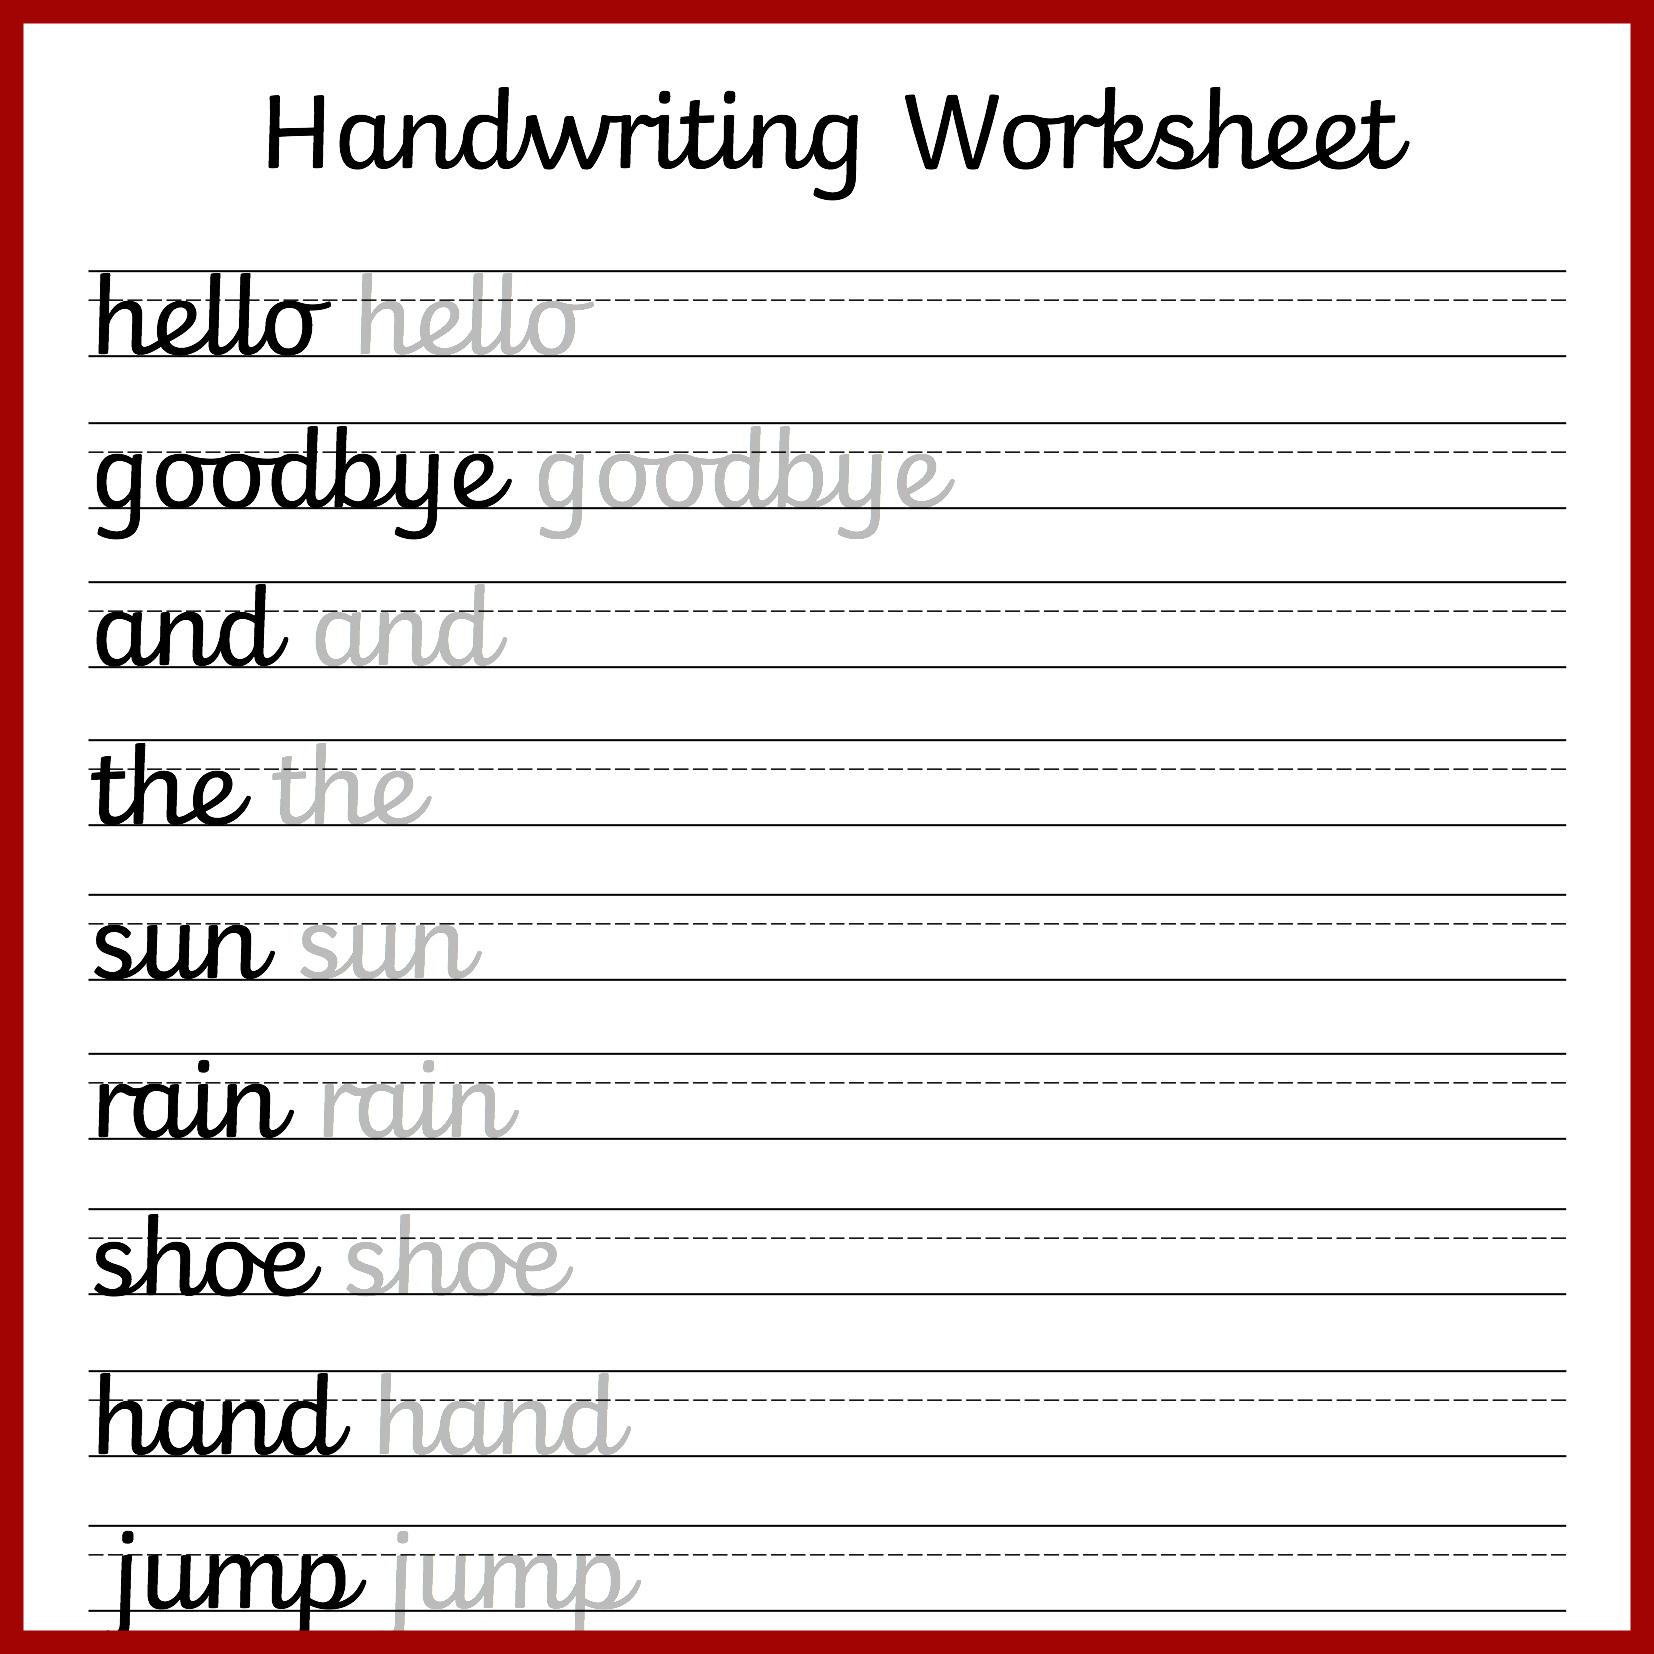 Cursive Handwriting Worksheets – Free Printable! ⋆ Mama Geek - Free Printable Cursive Handwriting Worksheets